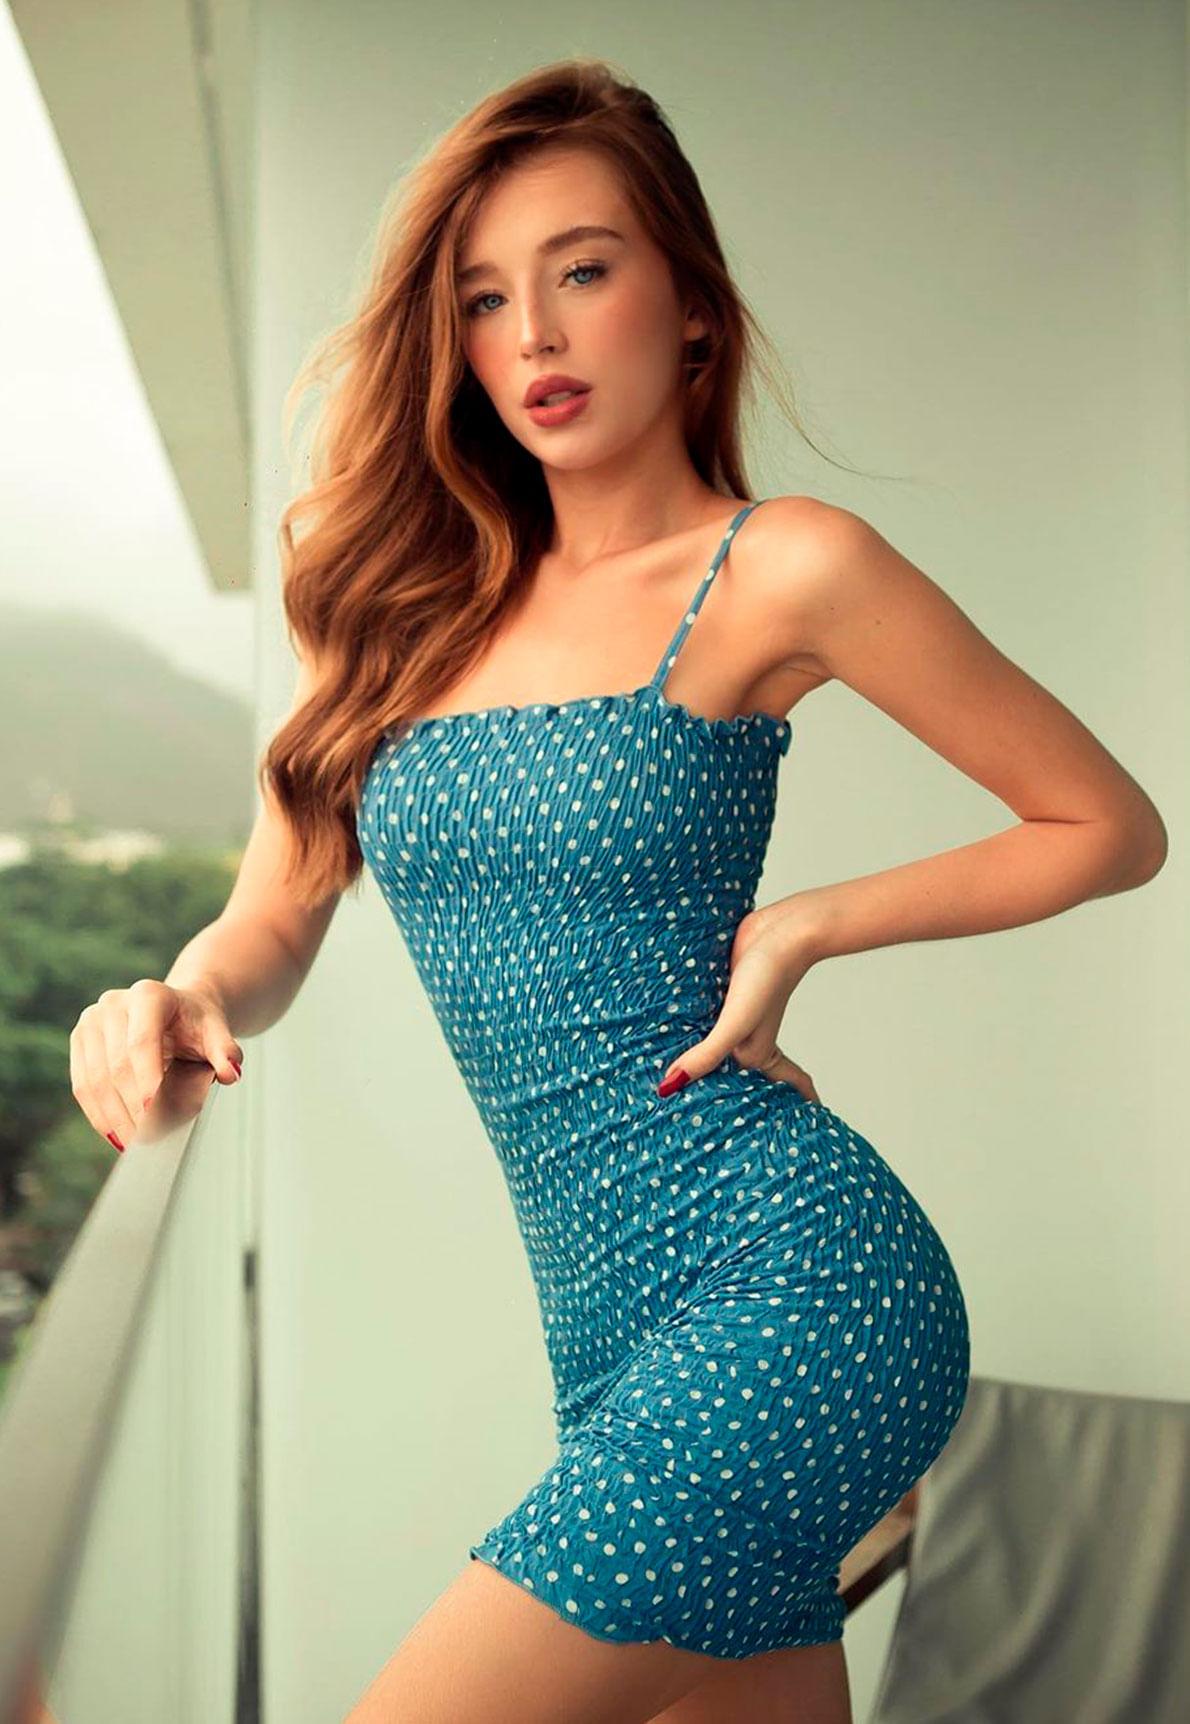 27991-vestido-bolinha-azul-lastex-bruna-mundo-lolita-10